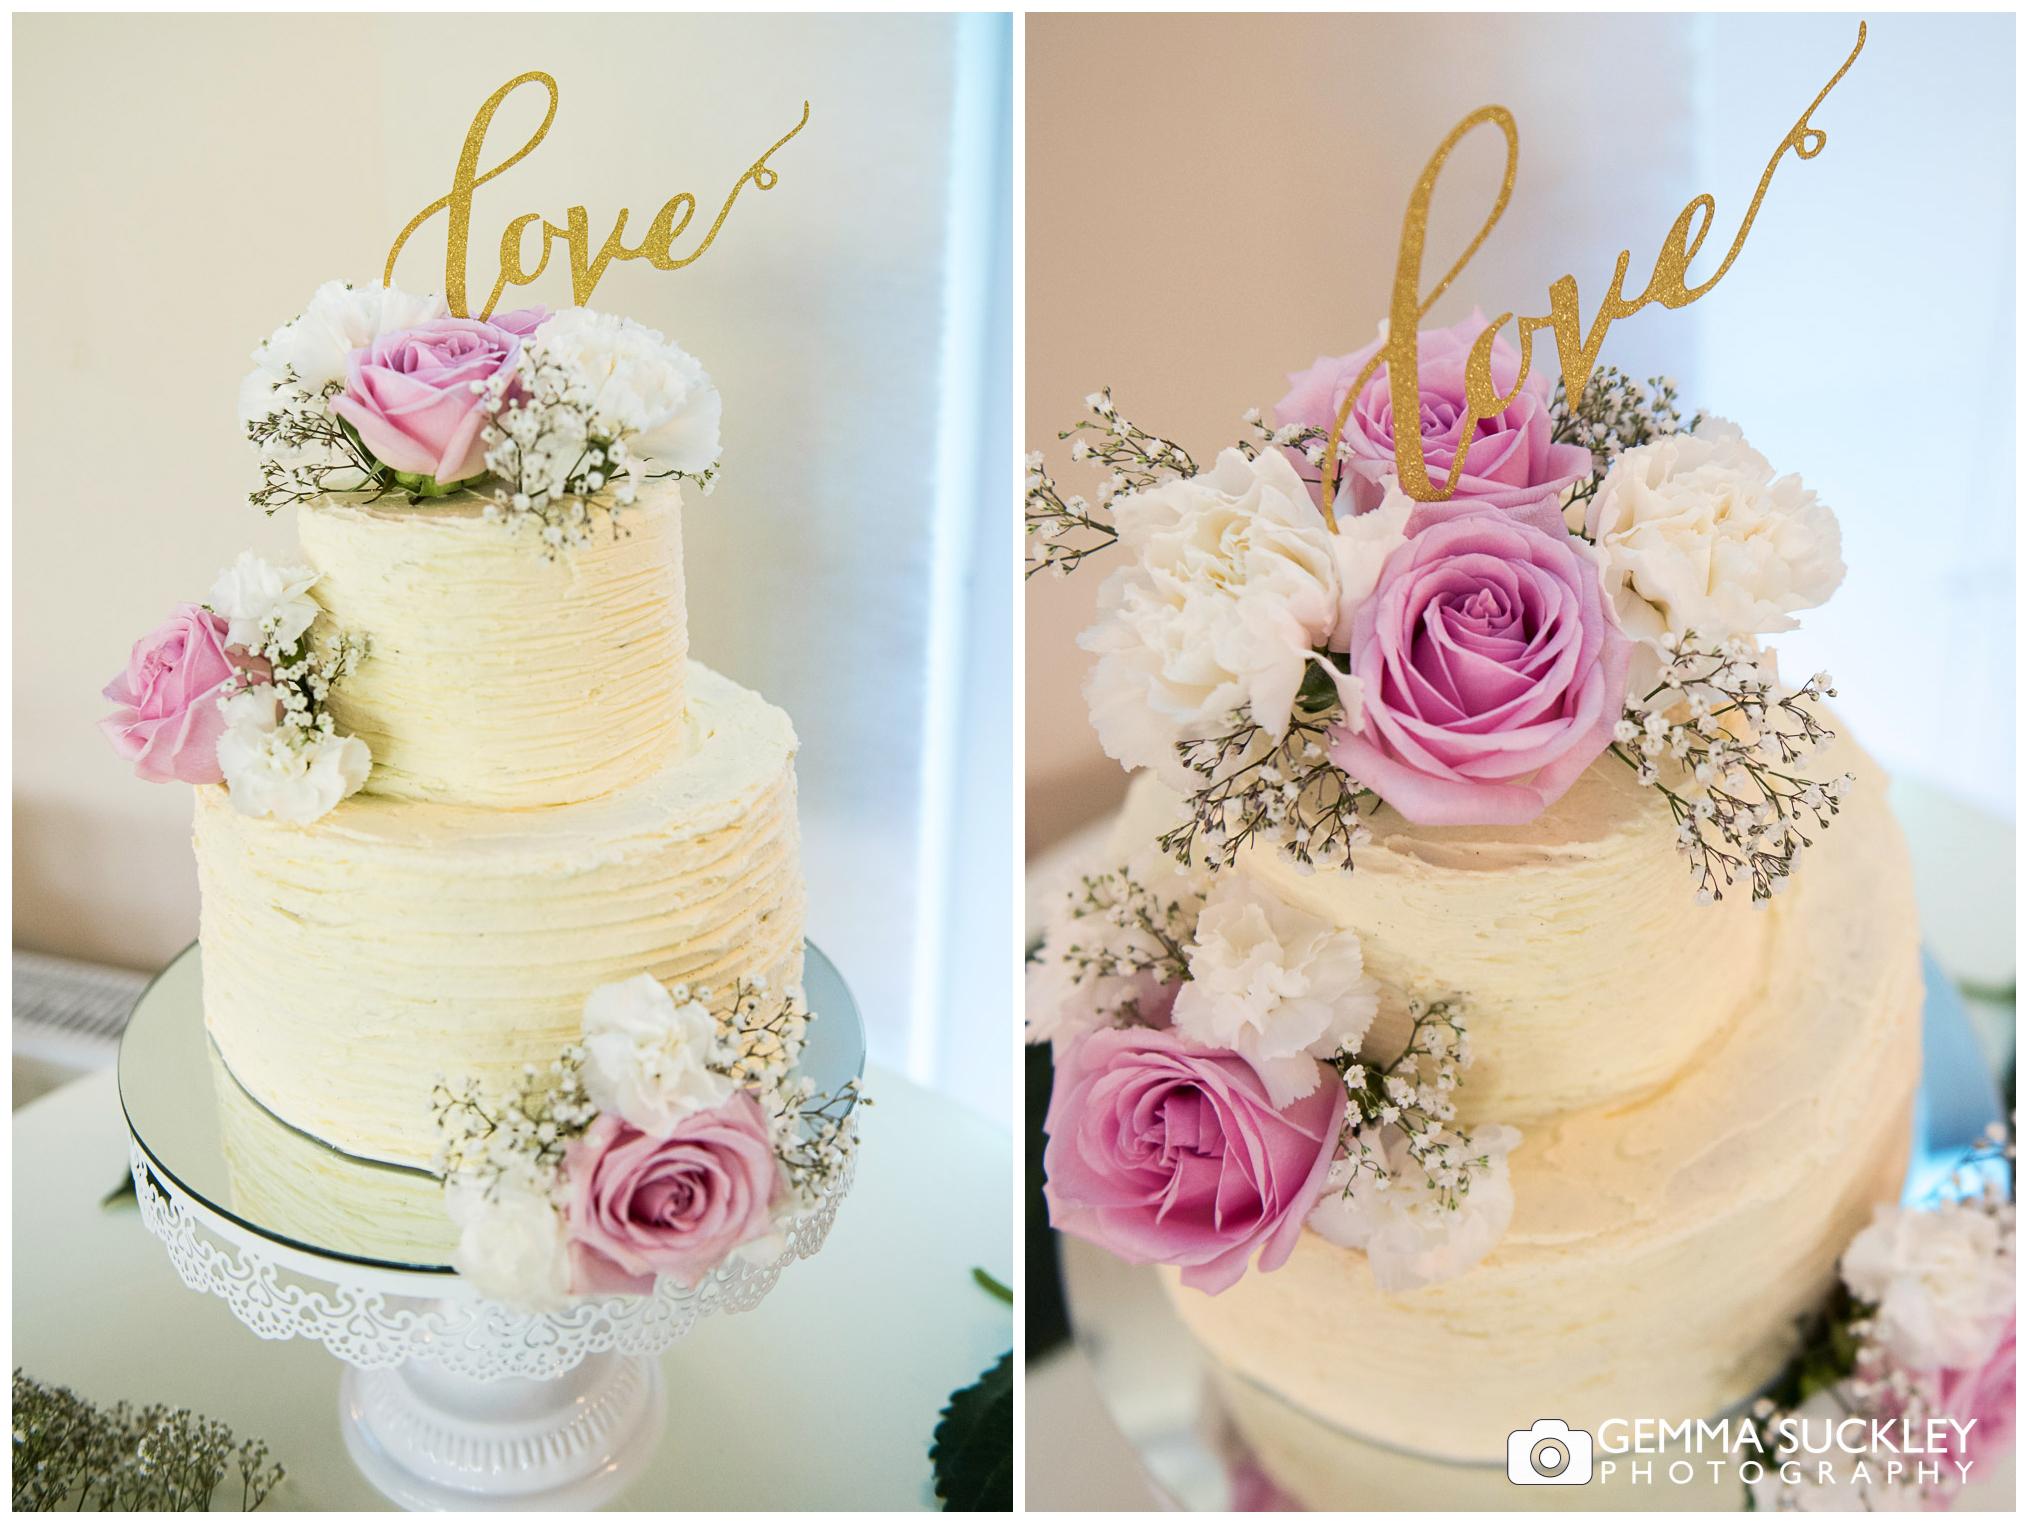 yorkshire-wedding-photographer-wedding-cake.jpg